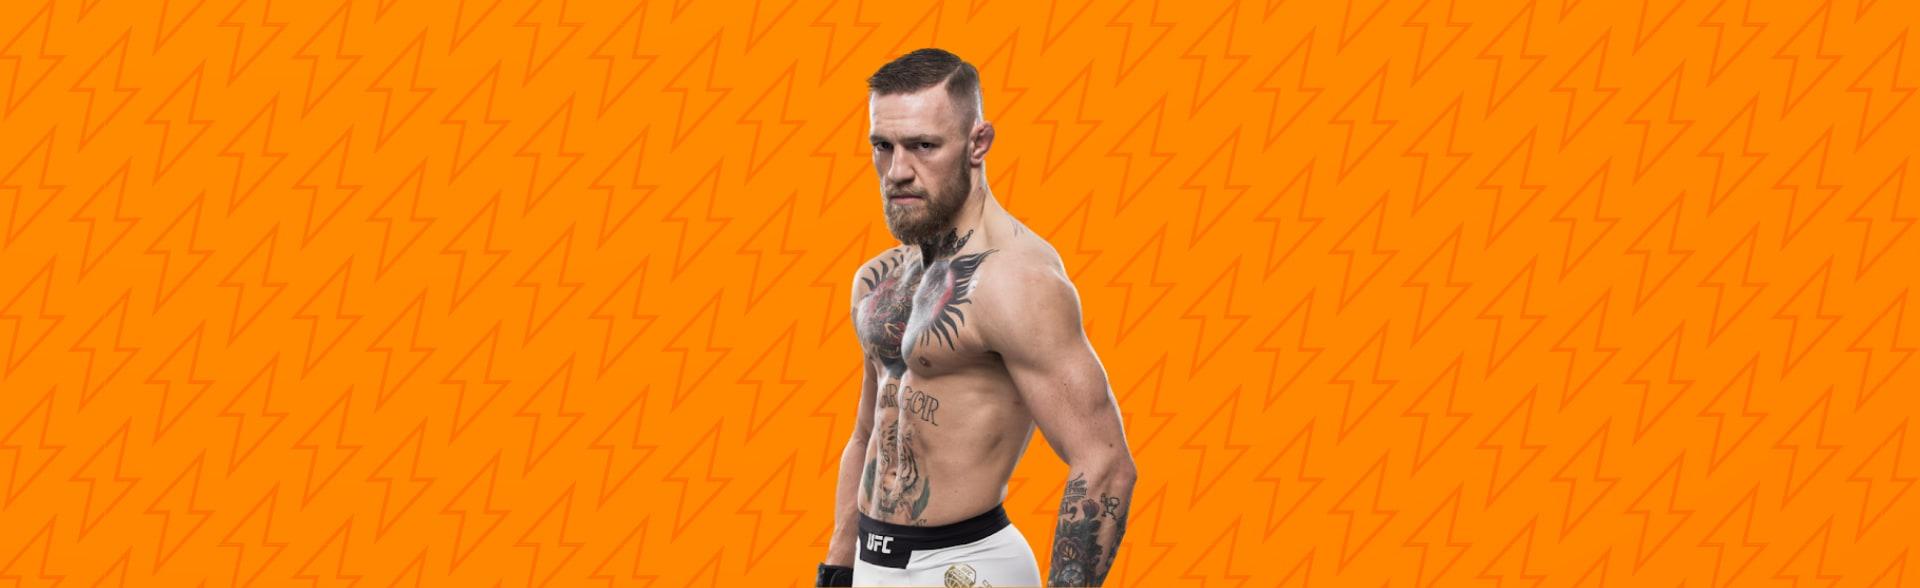 UFC 257: Poirier vs McGregor 2 - Notorious returns